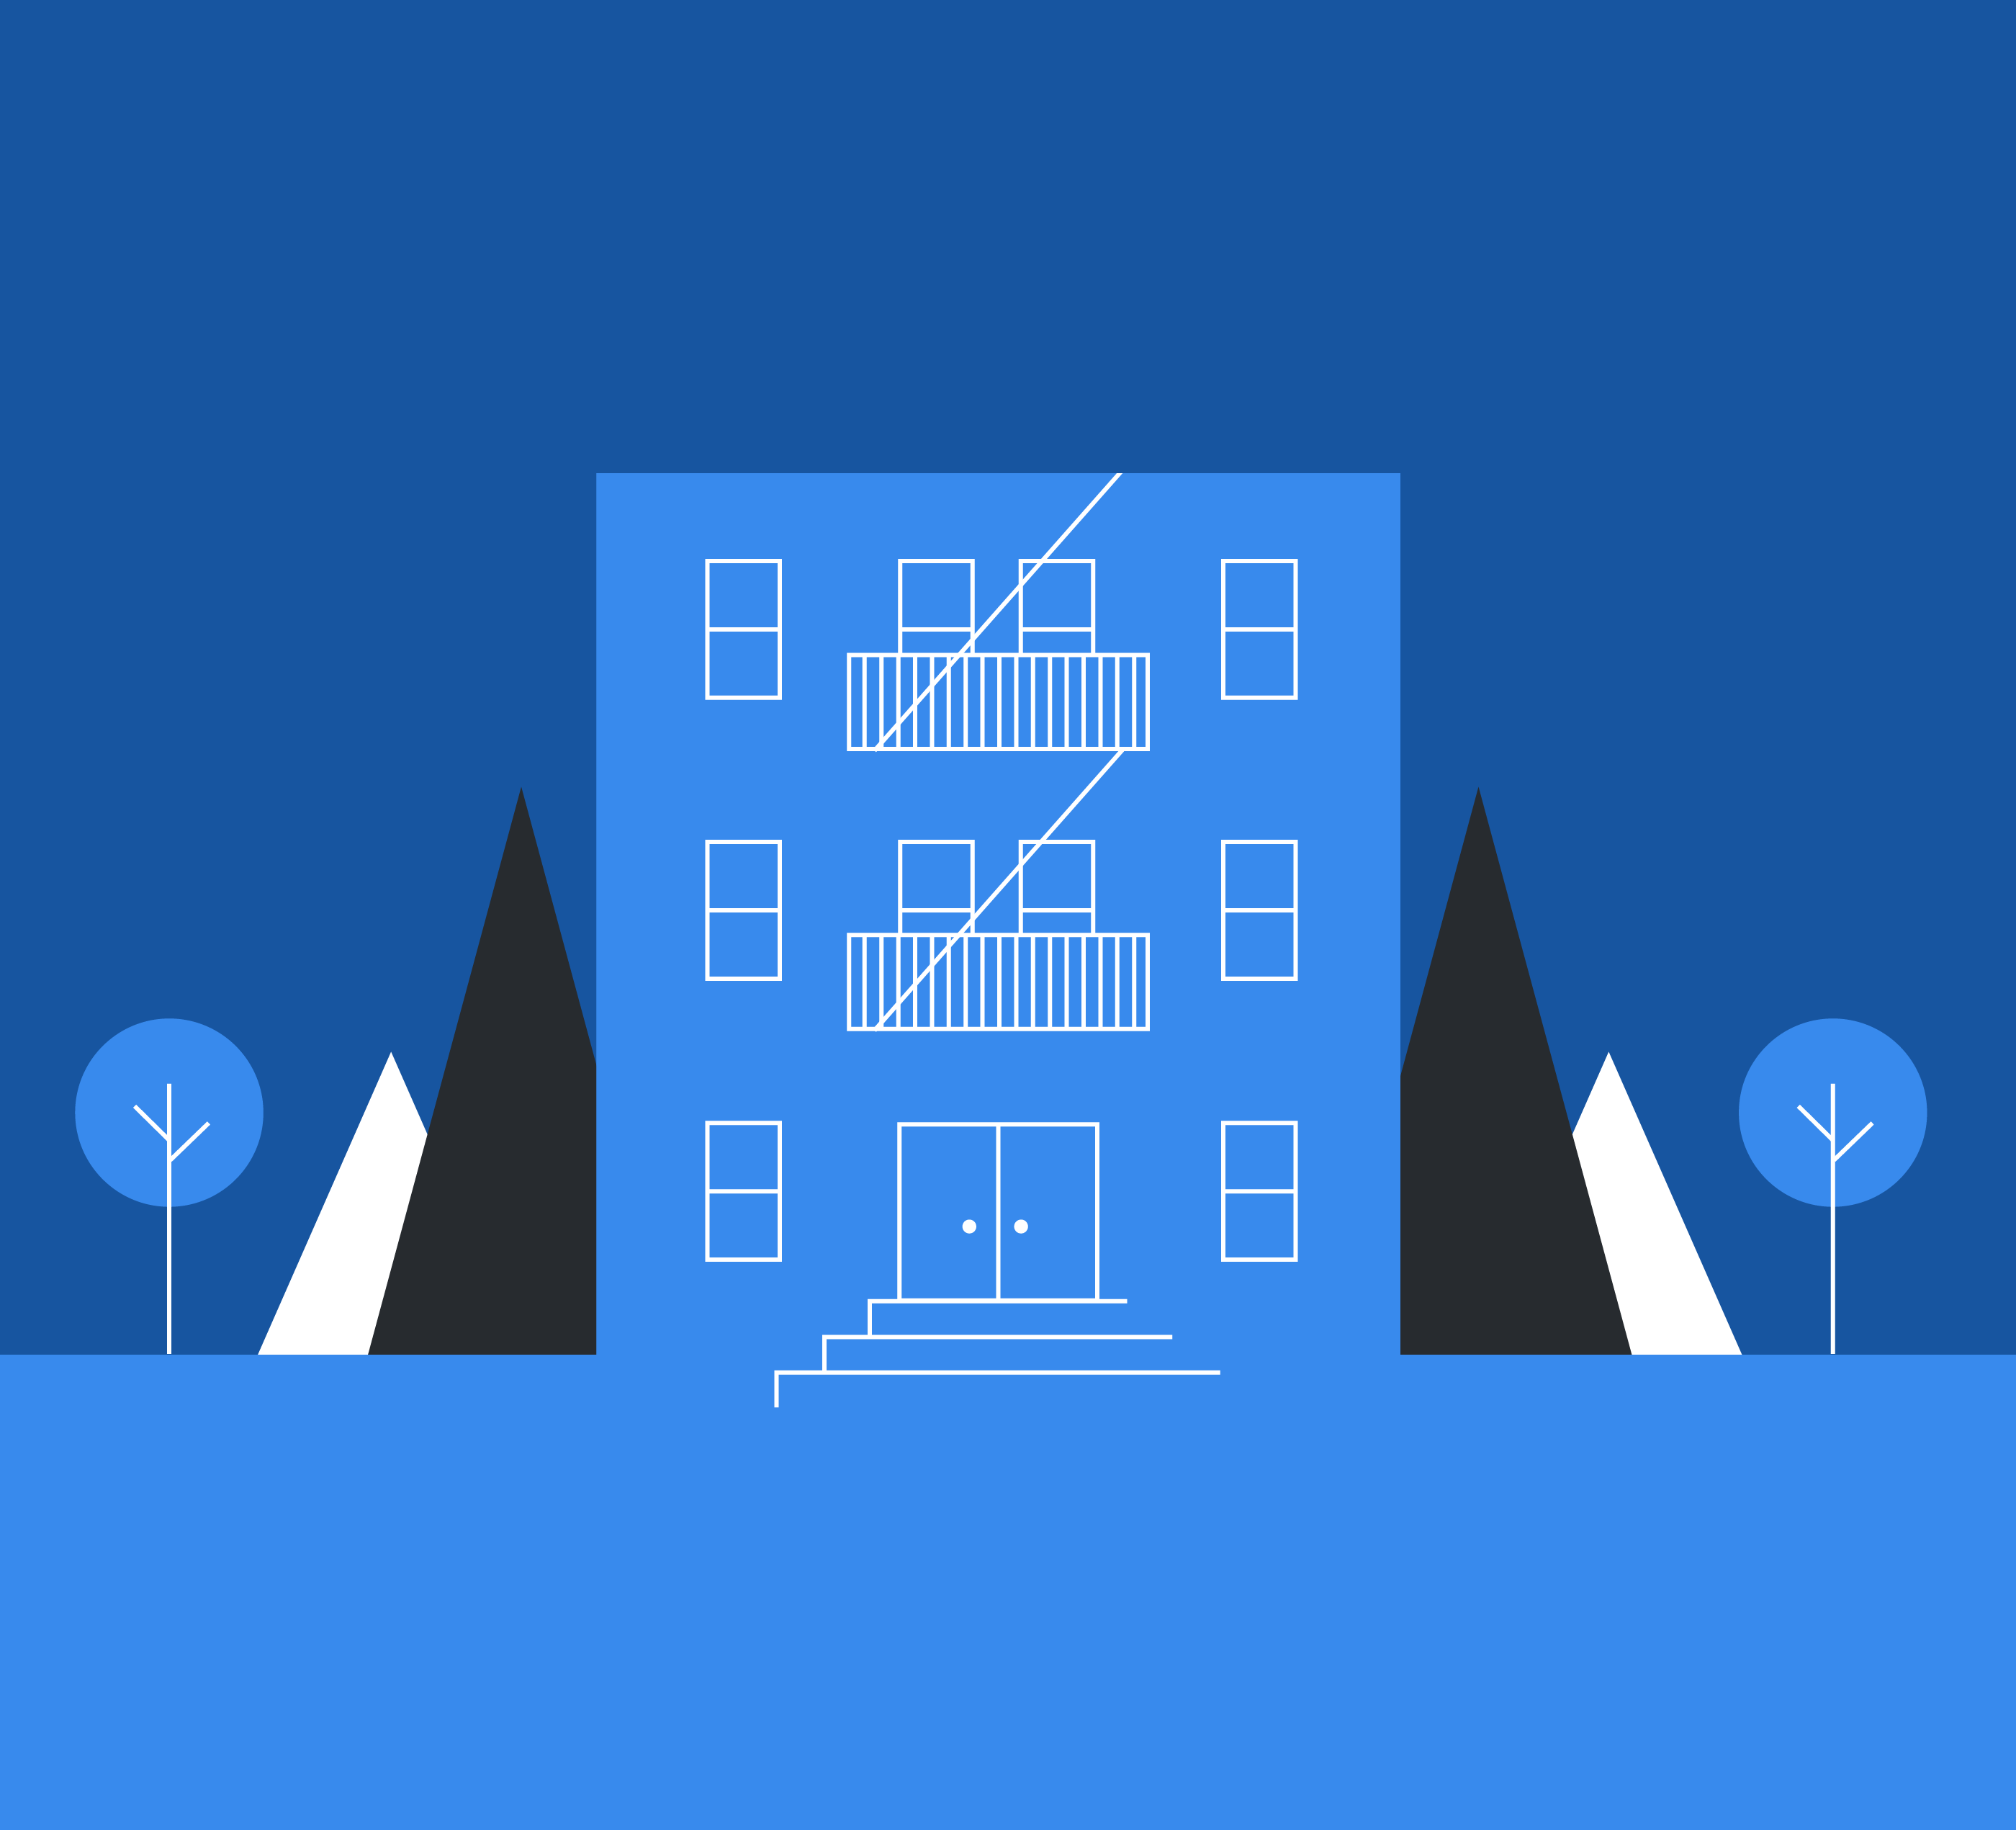 Illustrated apartment building